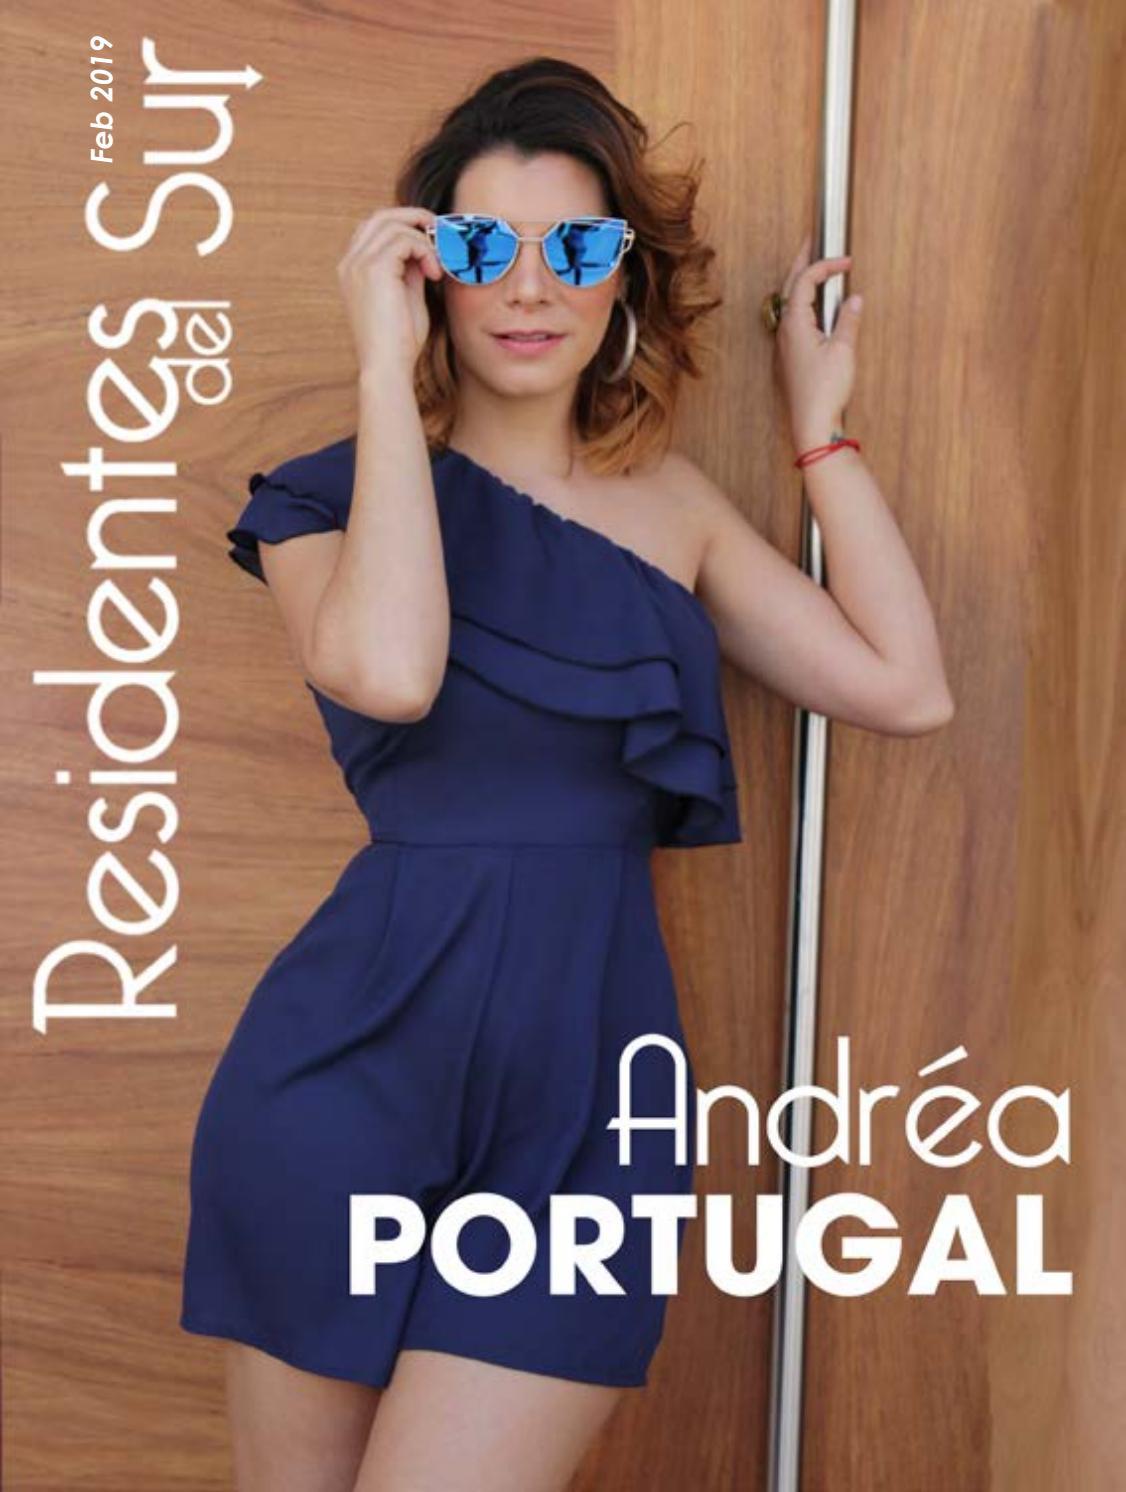 Andrea Duro Descuido revista residentes del sur - febrero 2019 - andréa portugal